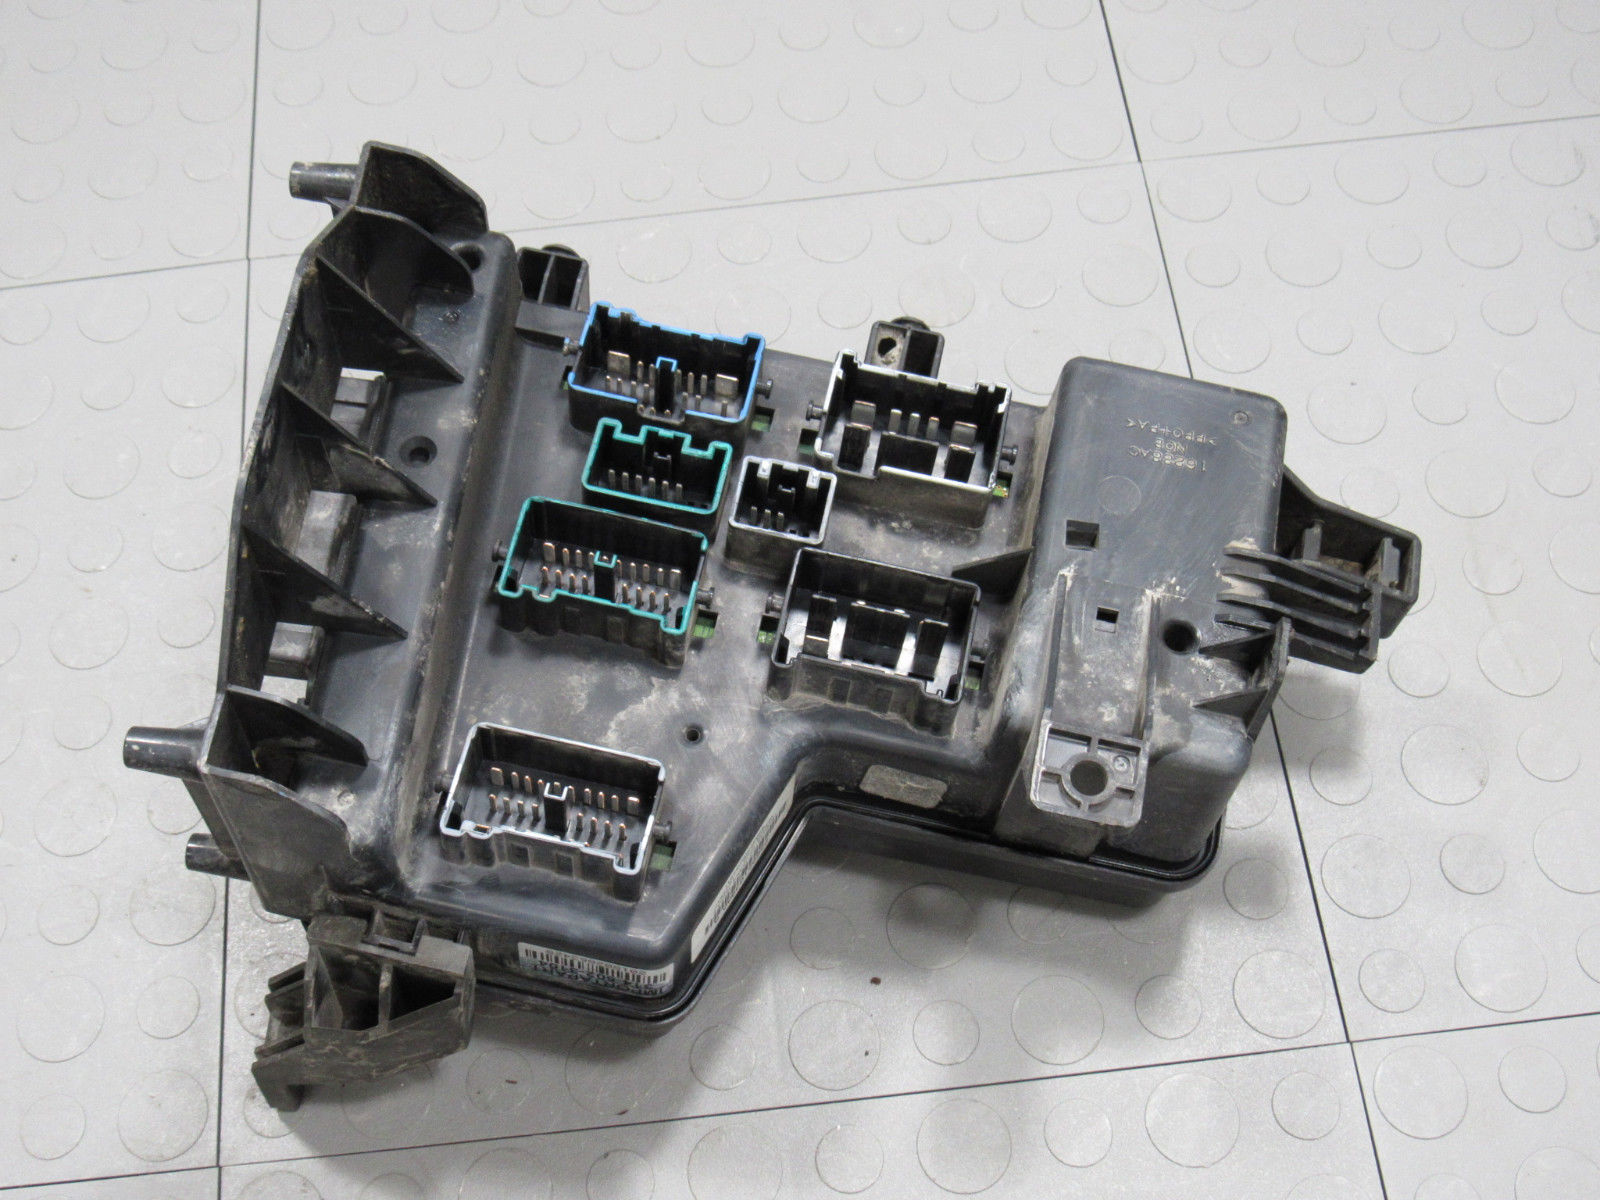 03 Dodge Truck Fuse Box Wiring Schematic Diagram 1995 Isuzu Pickup 05 Ram Ipm Integrated Power Module Block